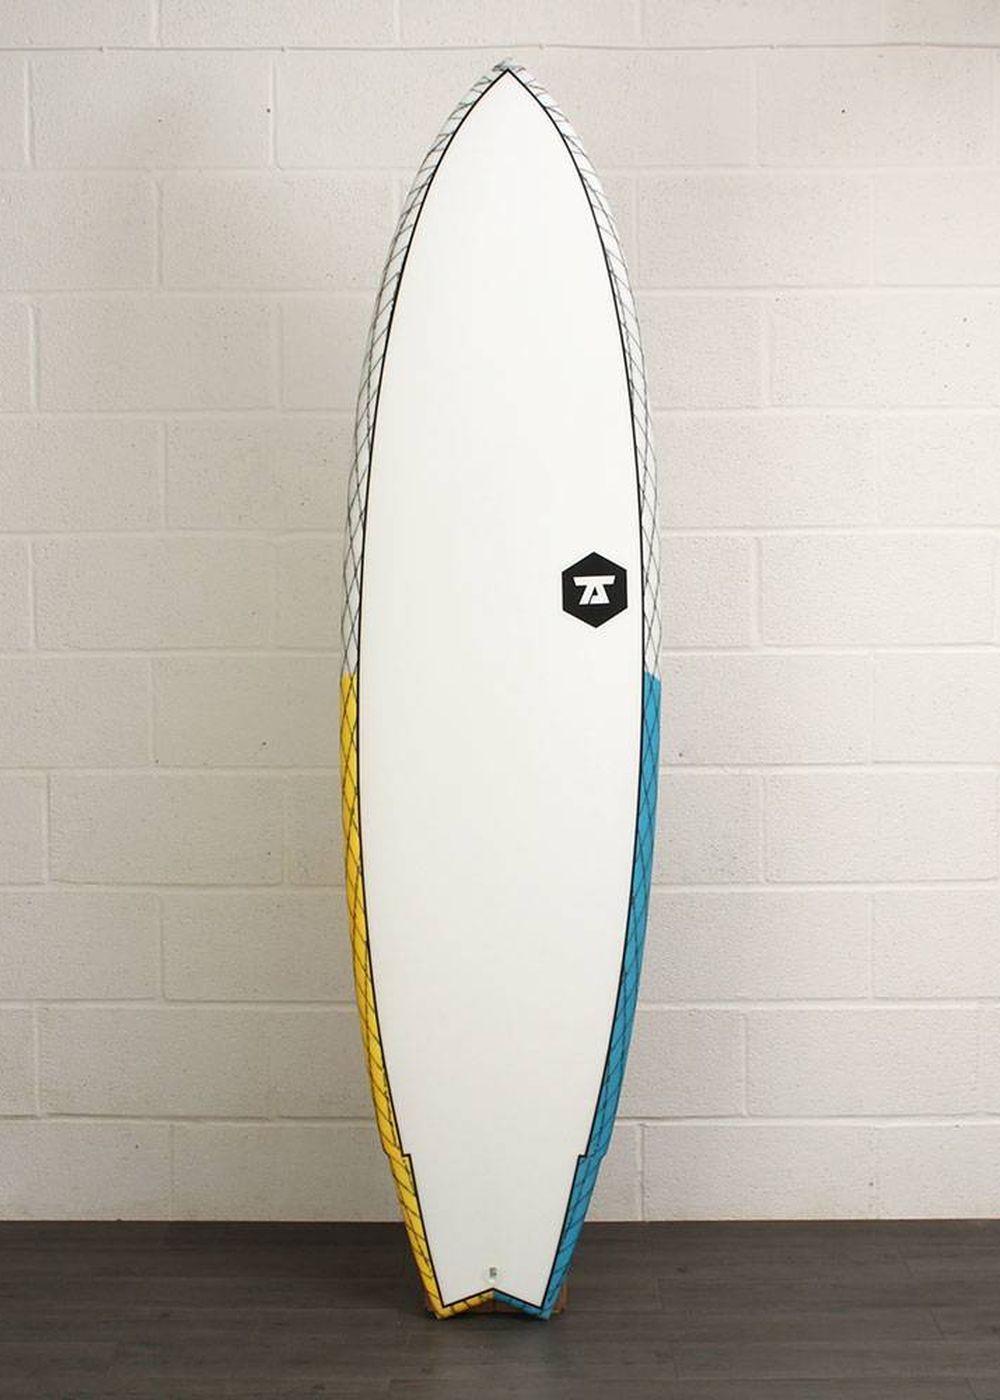 7S SUPER FISH 3 CV SURFBOARD 6ft 9 Yellow/Blue